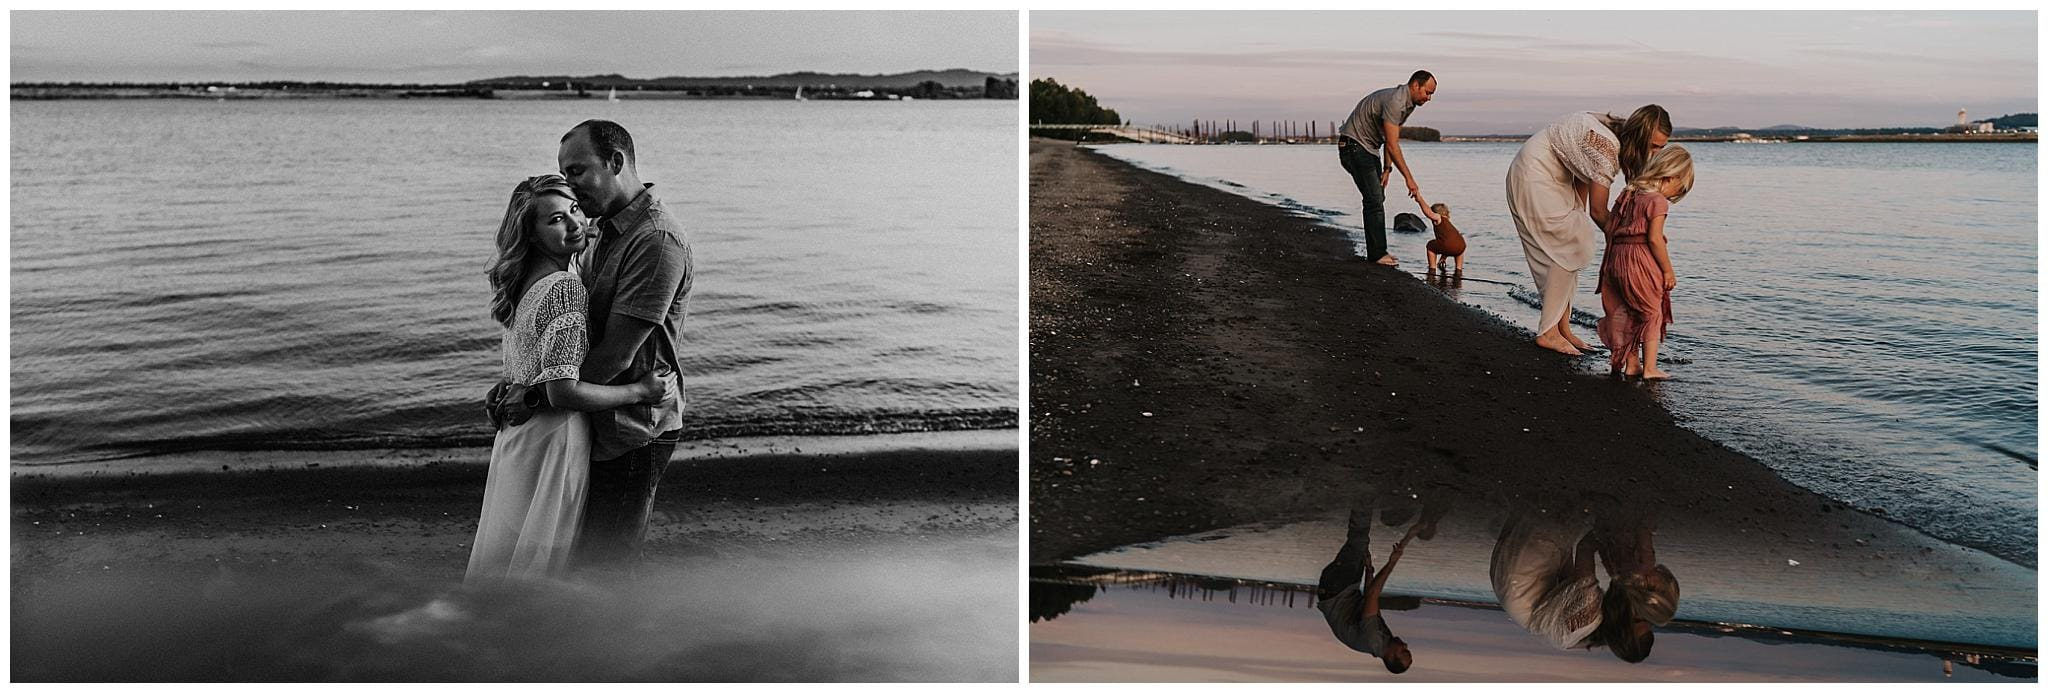 cellphone reflection photography - portland photographer